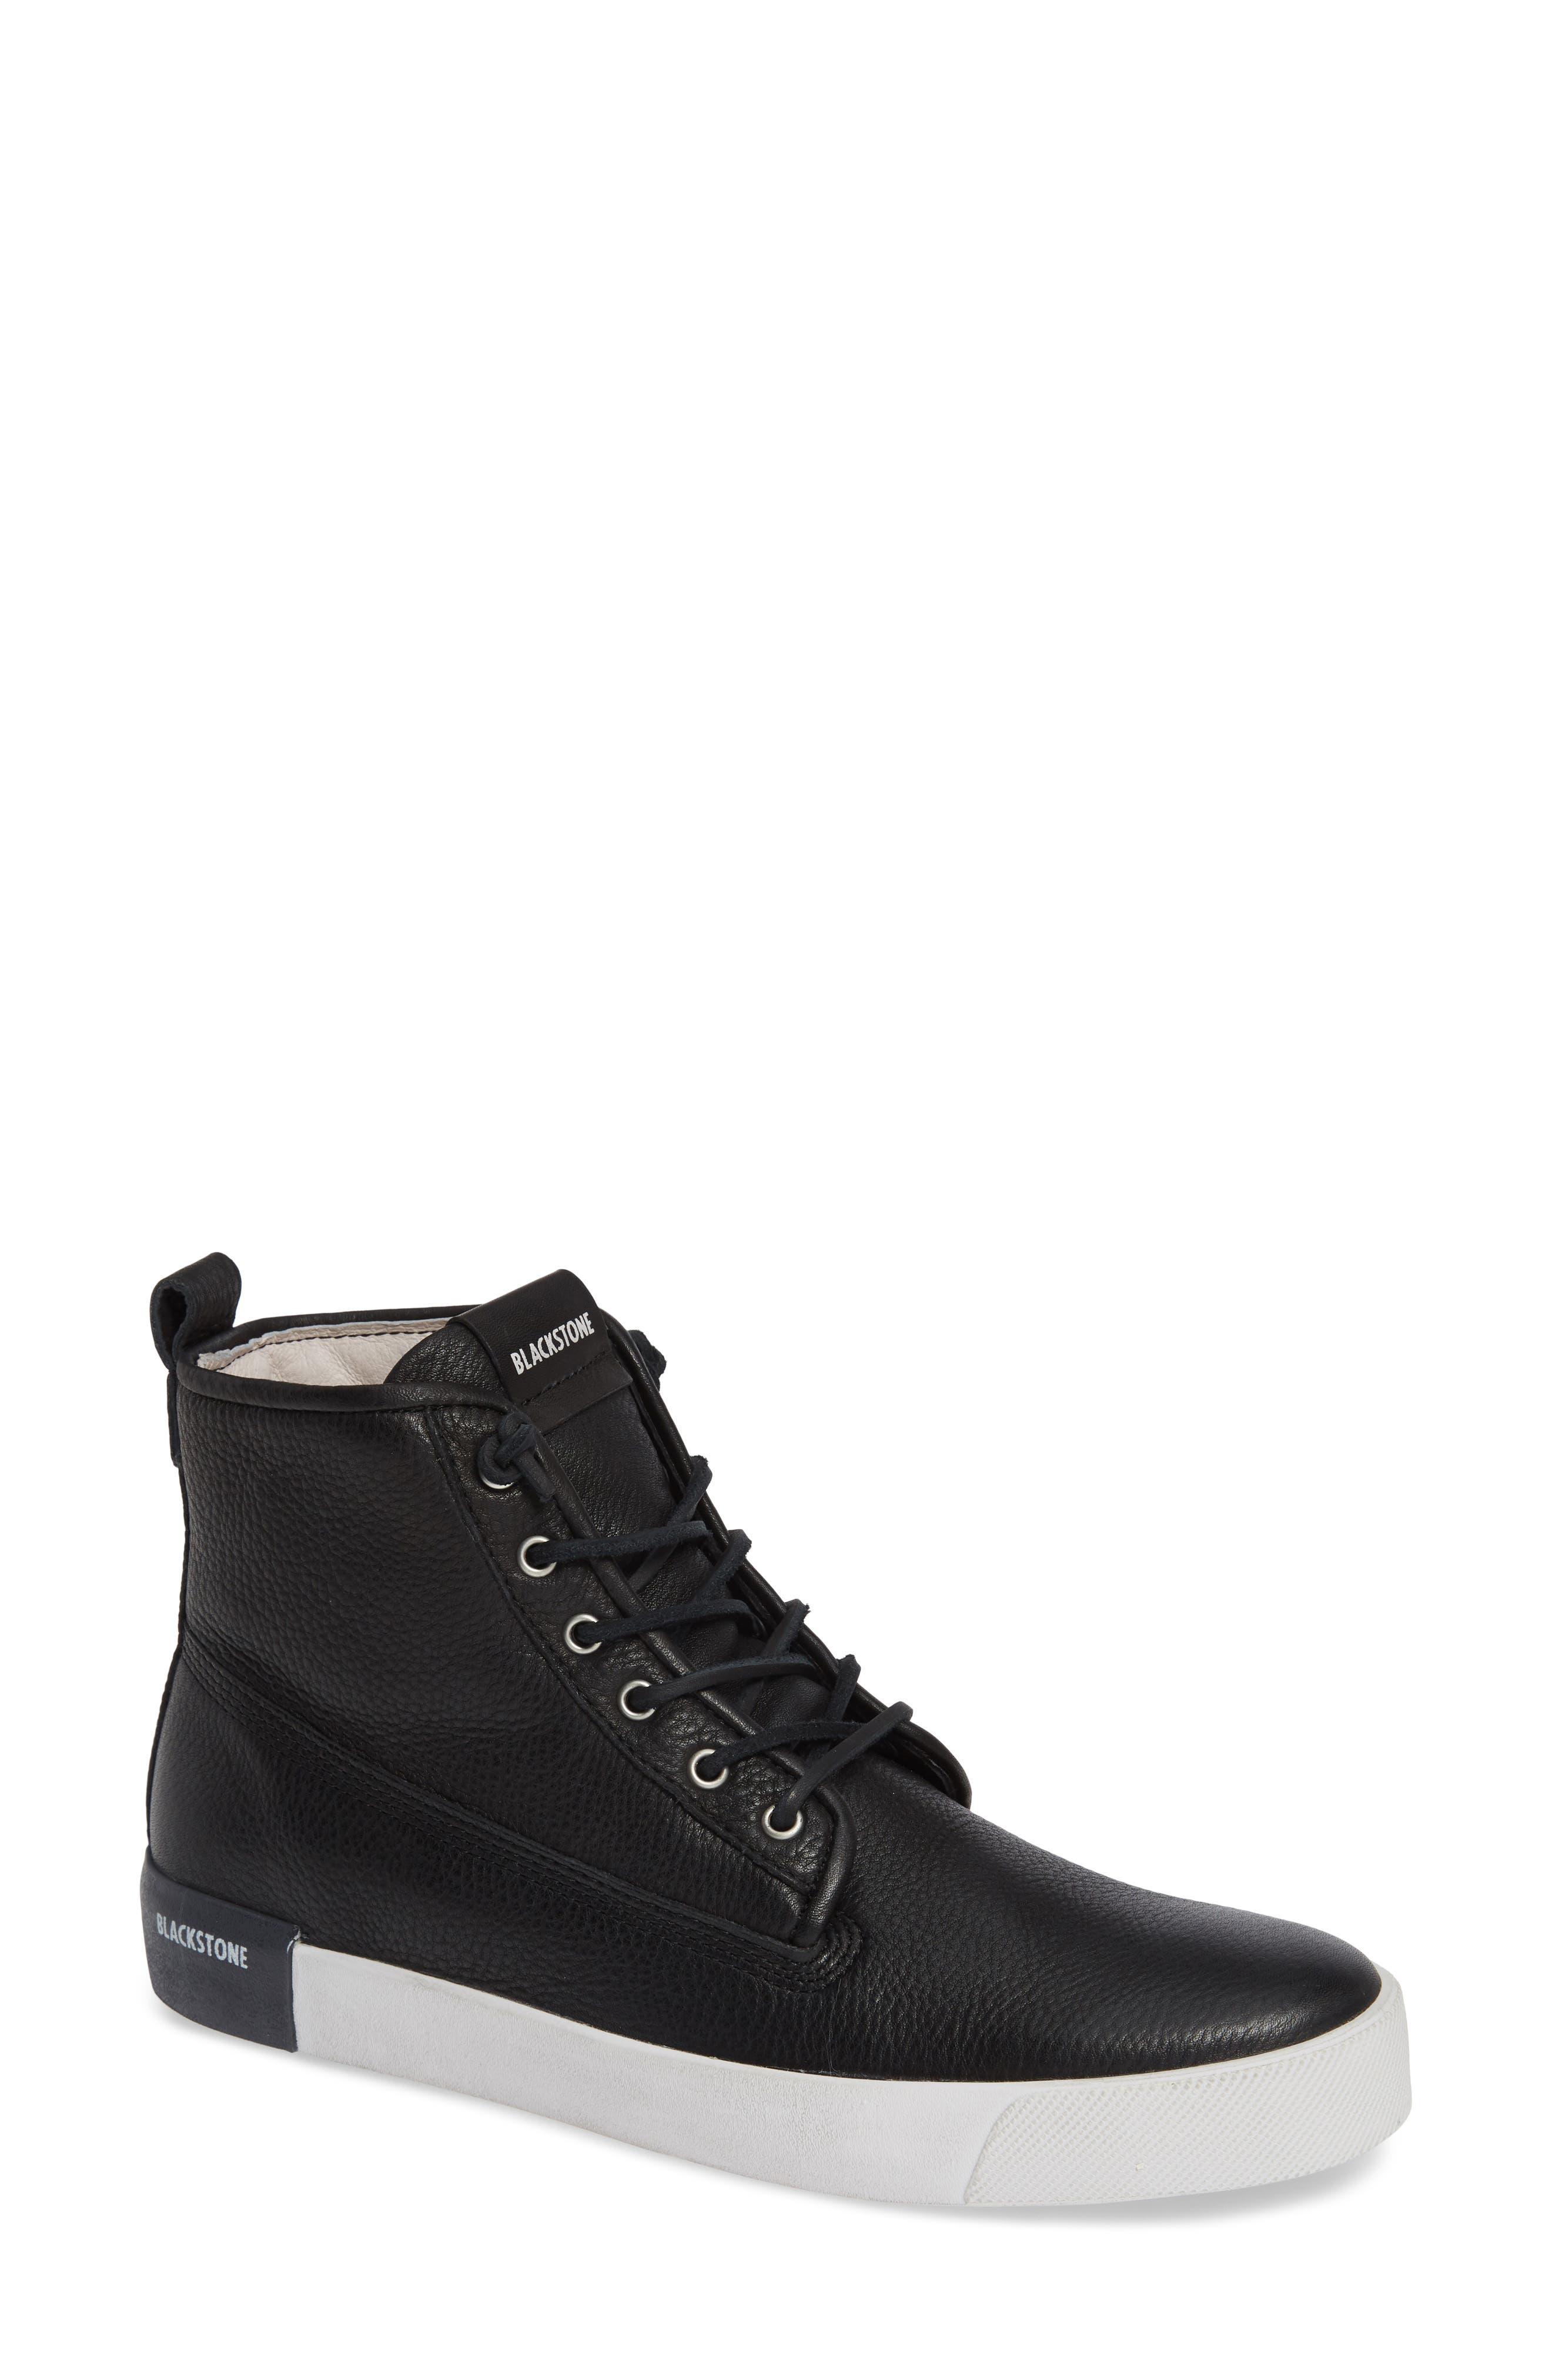 QM80 High Top Sneaker,                         Main,                         color, BLACK